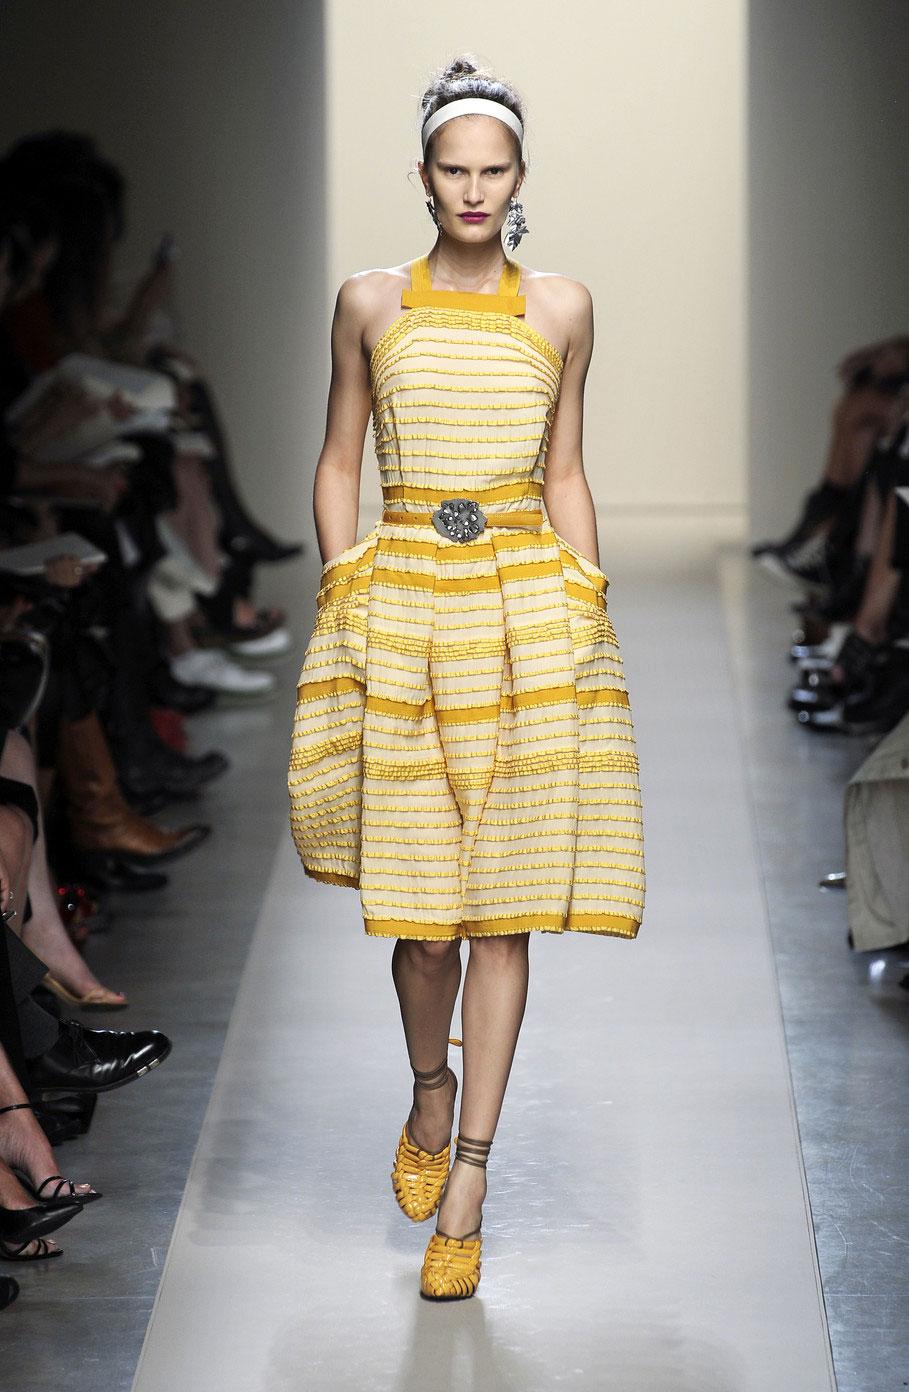 via fashioned by love   Bottega Veneta Spring/Summer 2010